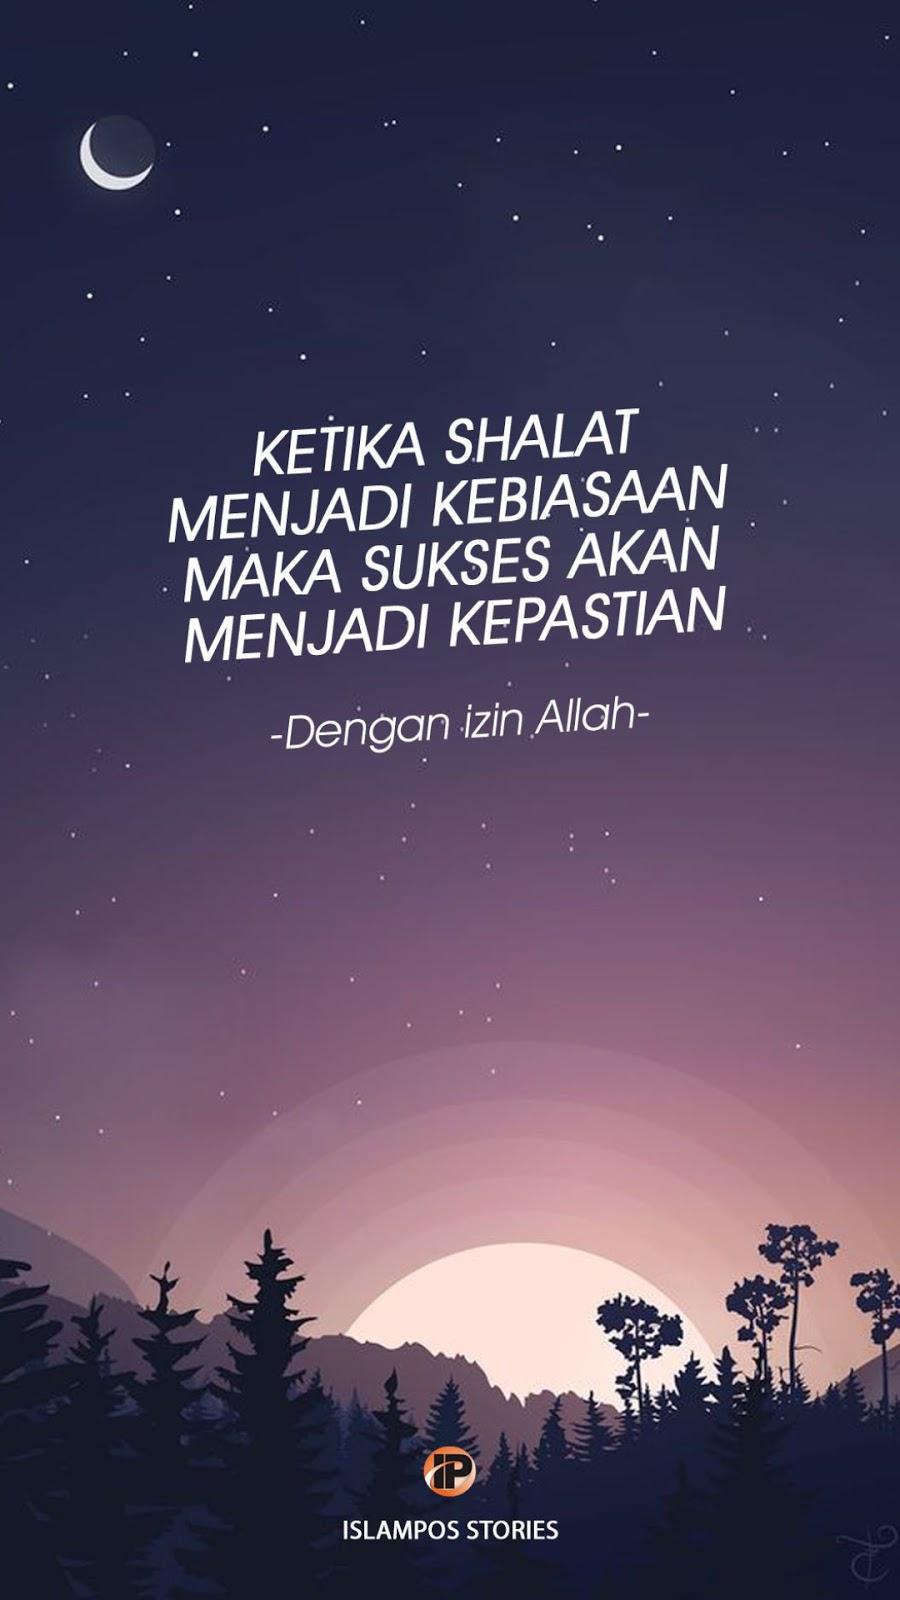 Wallpaper Ramadhan Keren Untuk HP Ukuran HD bulan prunama keren